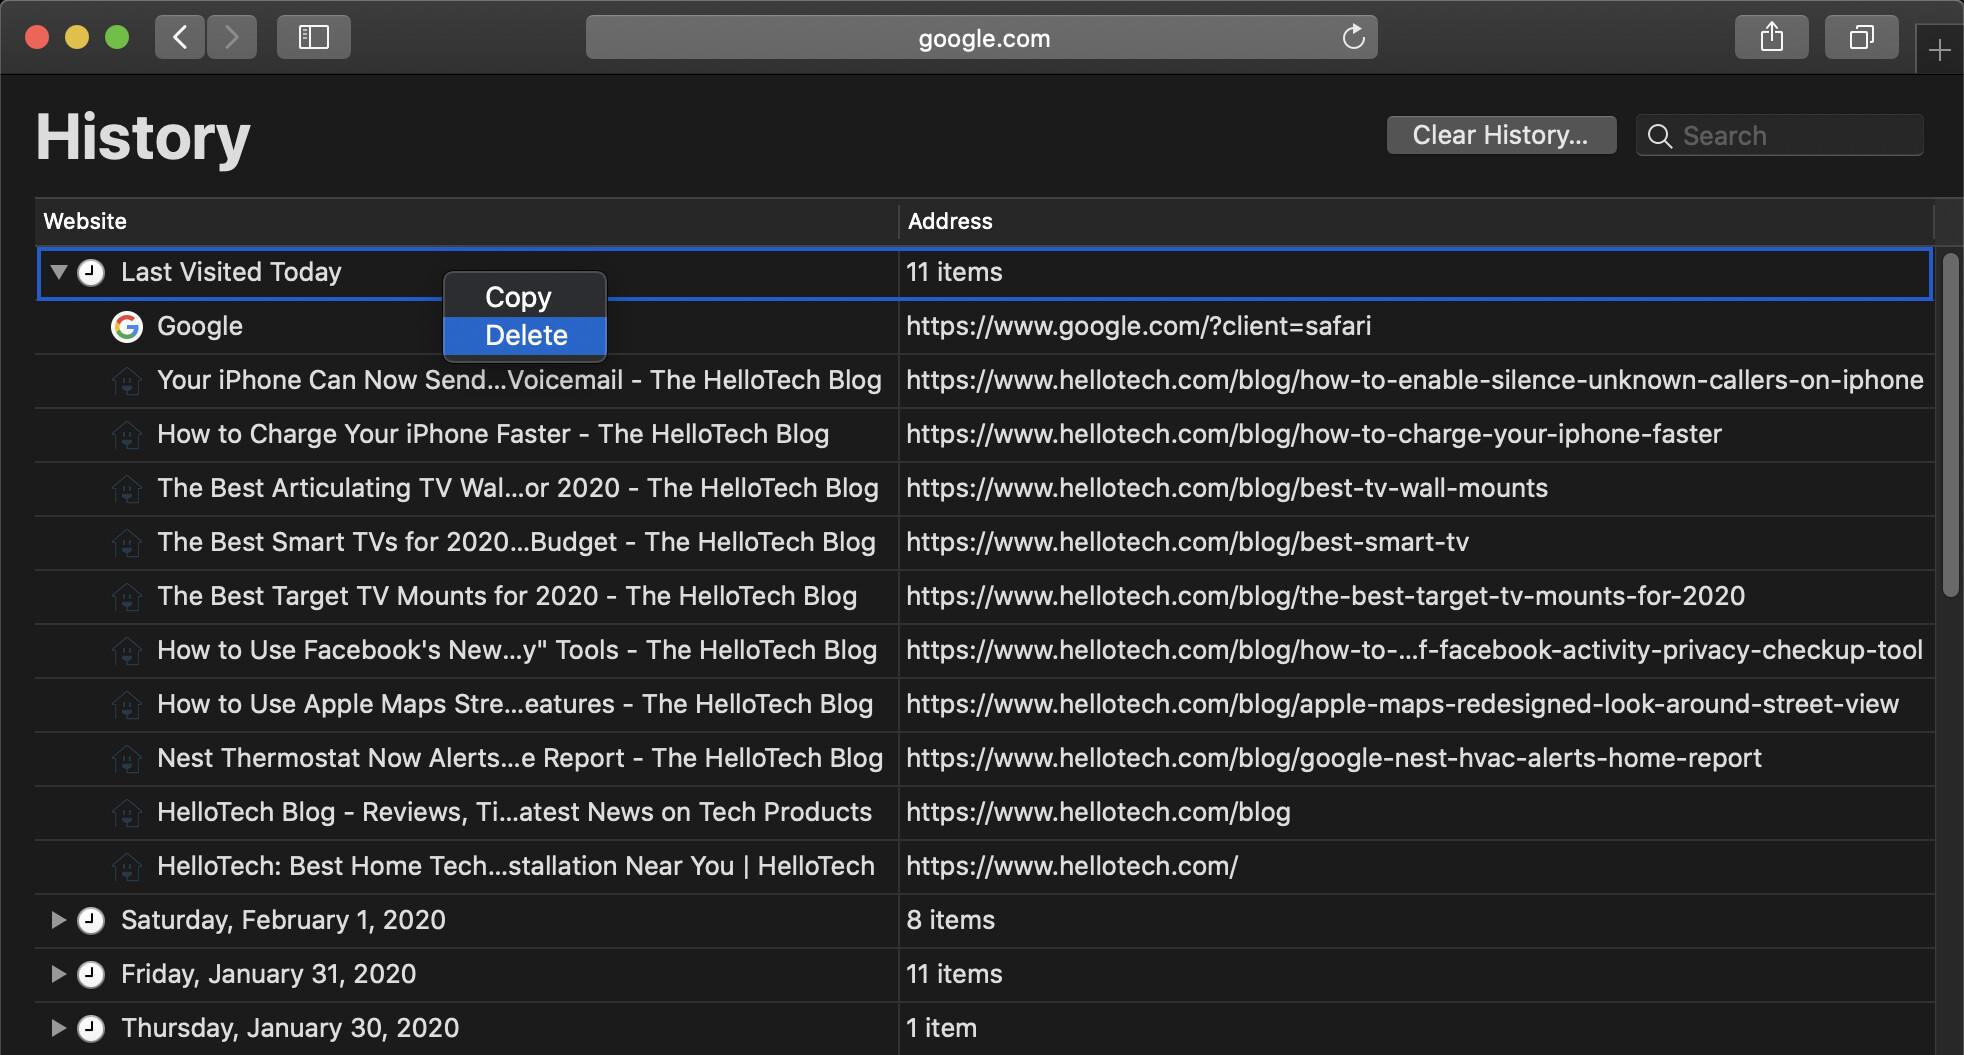 9. Cara Menghapus Riwayat Pencarian di Chrome Safari Firefox dan Edge